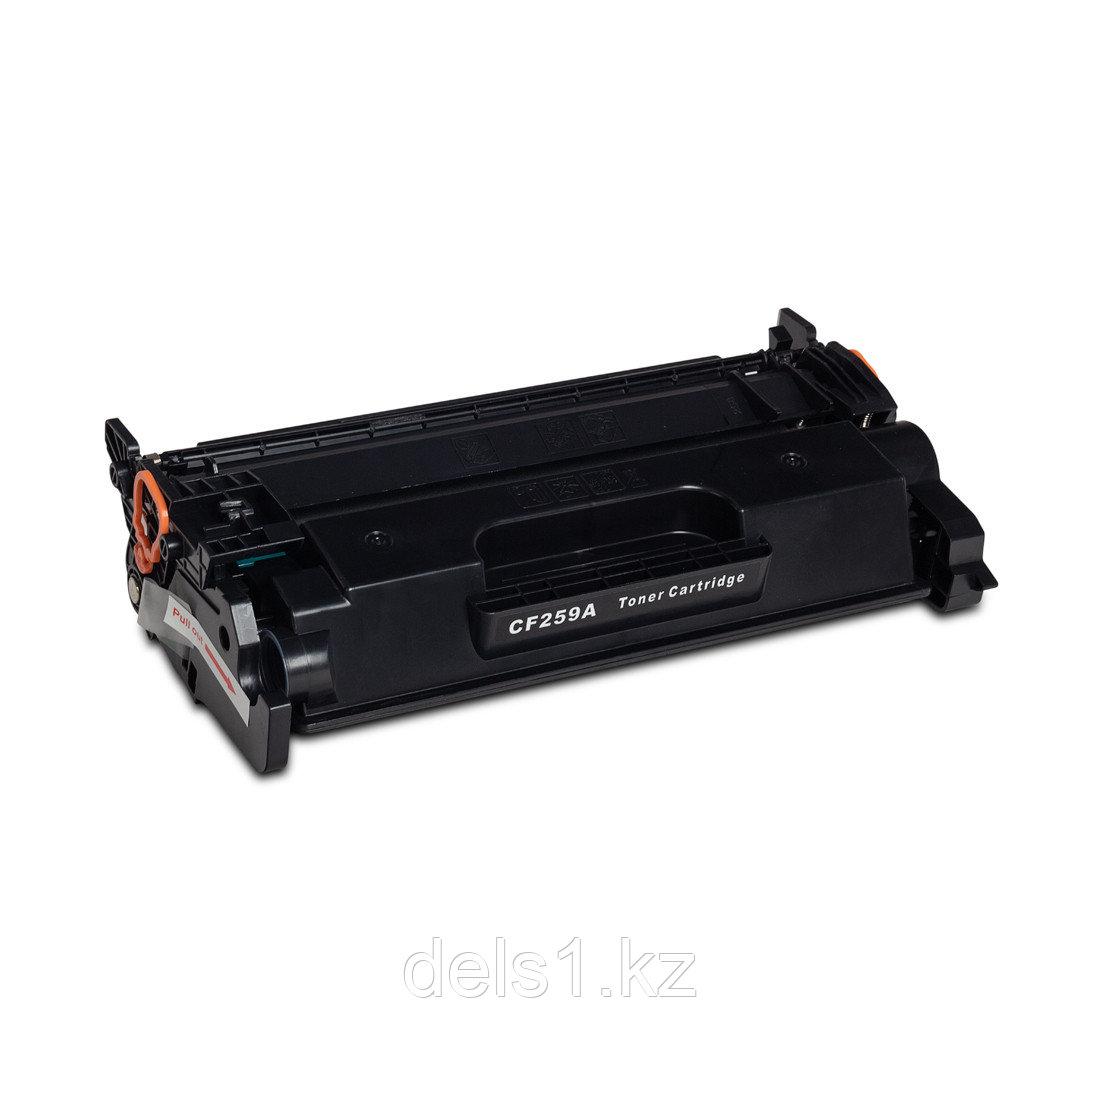 Картридж, Colorfix, CF259A (Без чипа), Для HP LaserJet Pro M404n/M404dn/M404dw/MFP M428dw/M428fdn/M428fdw